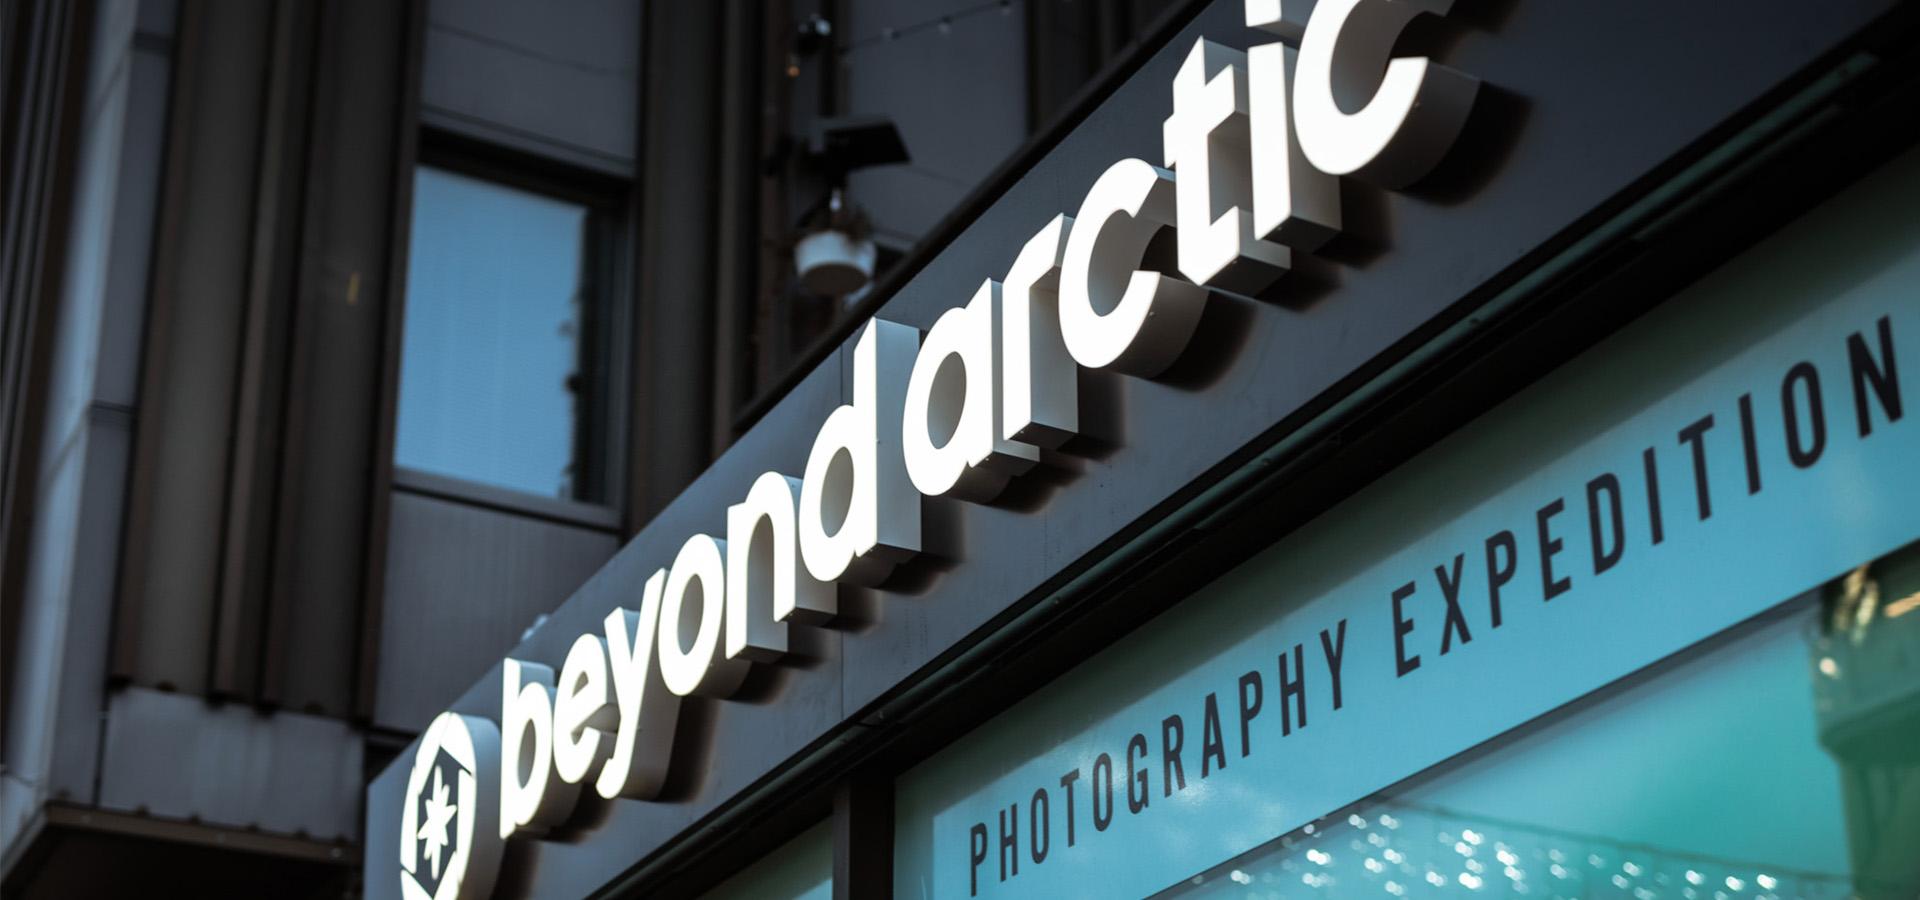 BeyondArctic-Toimipiste2-KotaCollectivePhoto.jpg